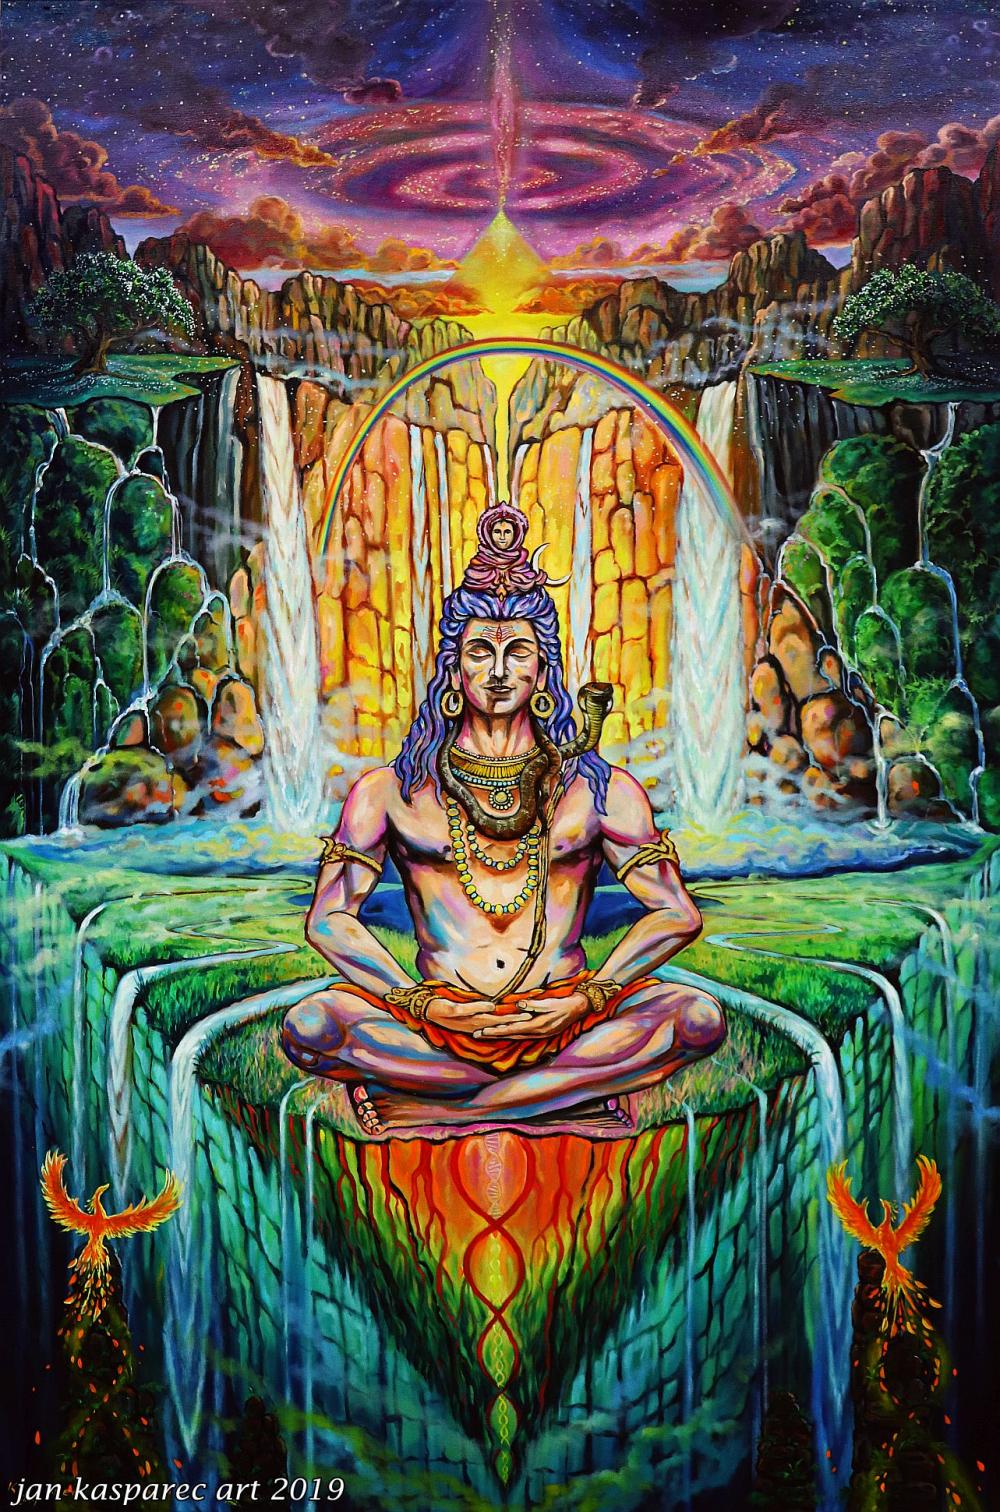 Oil painting - Shiva Phoenix